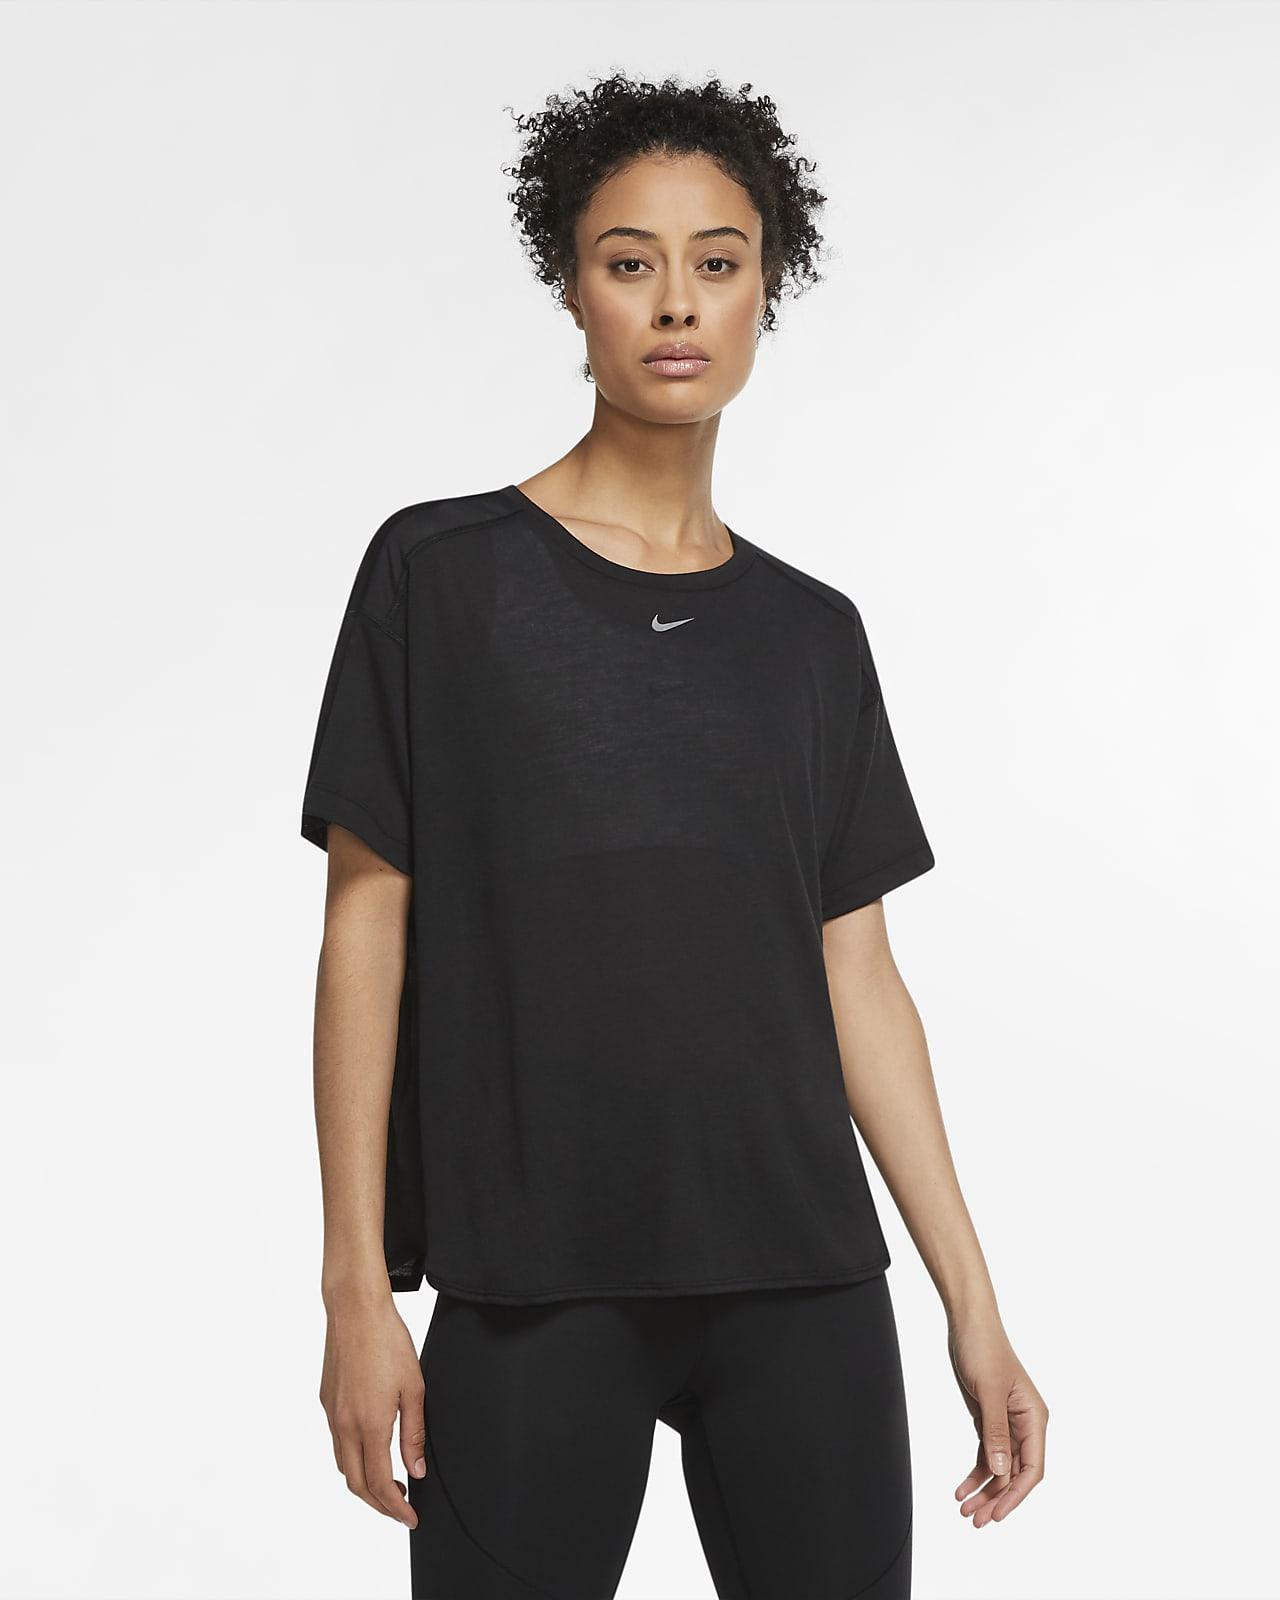 Женская футболка с коротким рукавом Nike Pro AeroAdapt